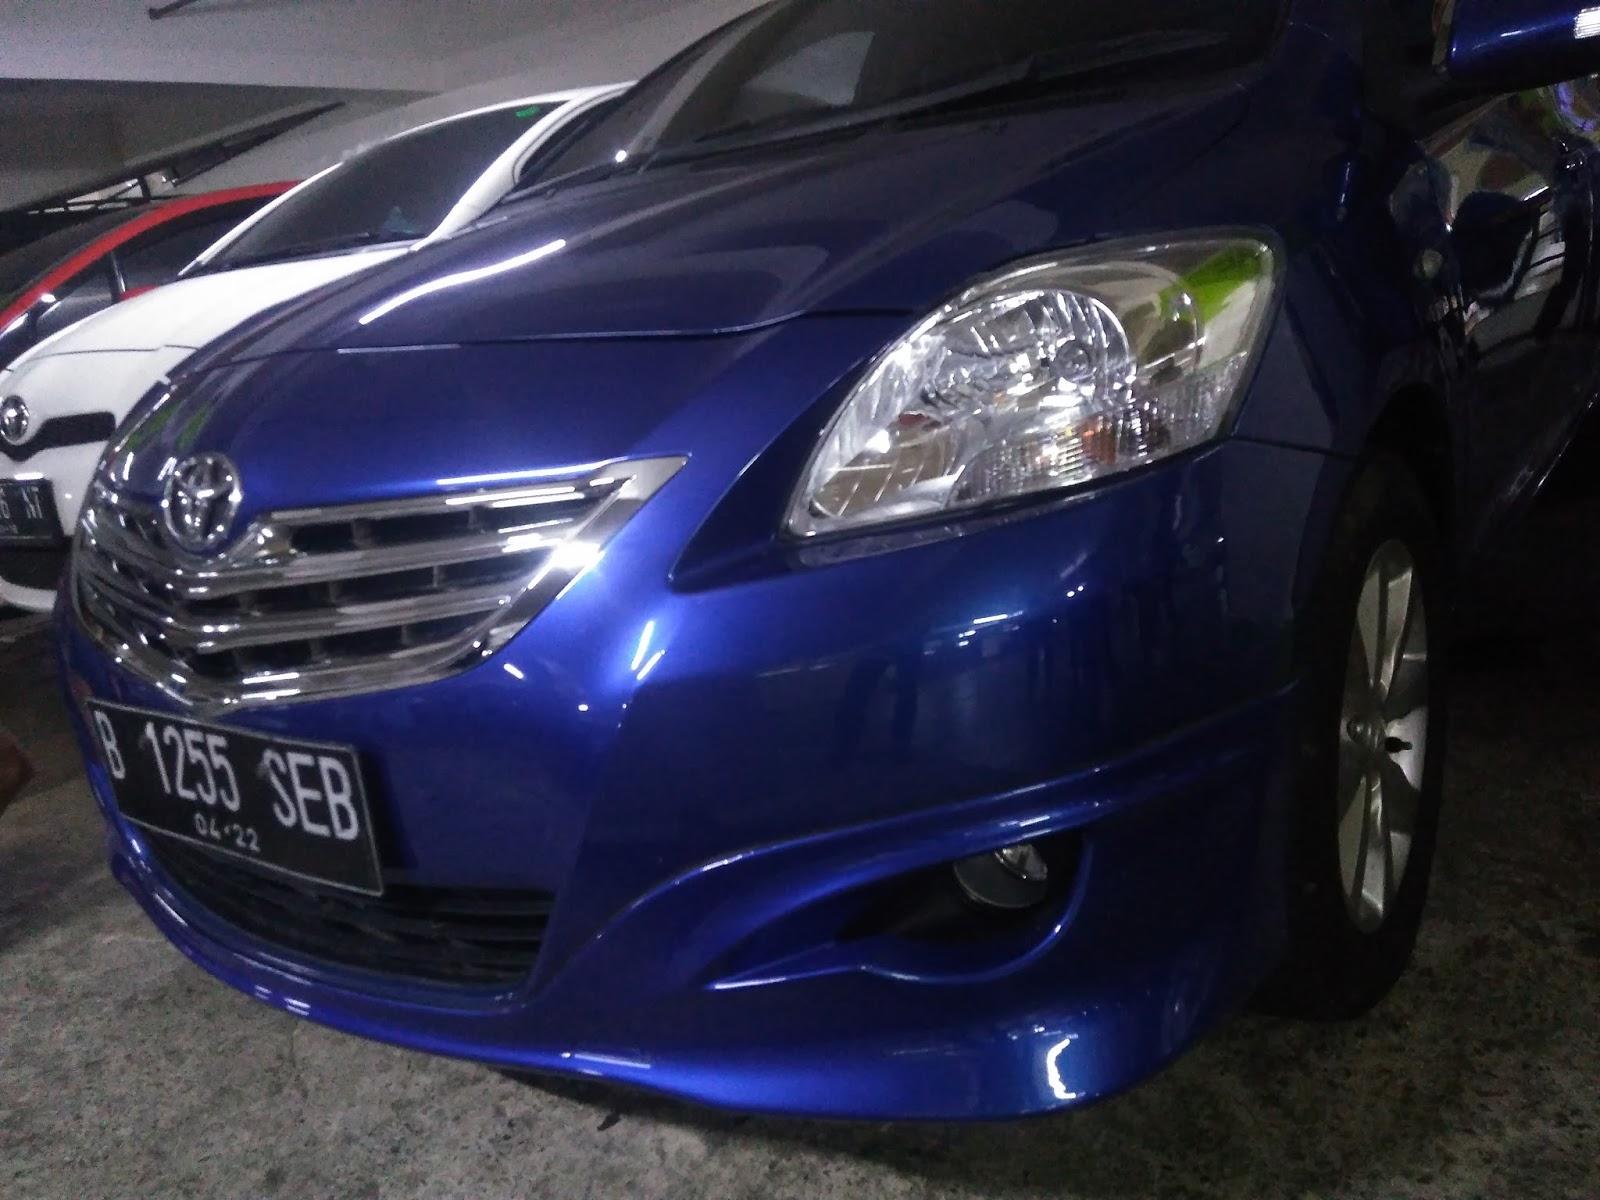 harga bluebird - juni 2012 jual mobil ex taksi blue bird ...